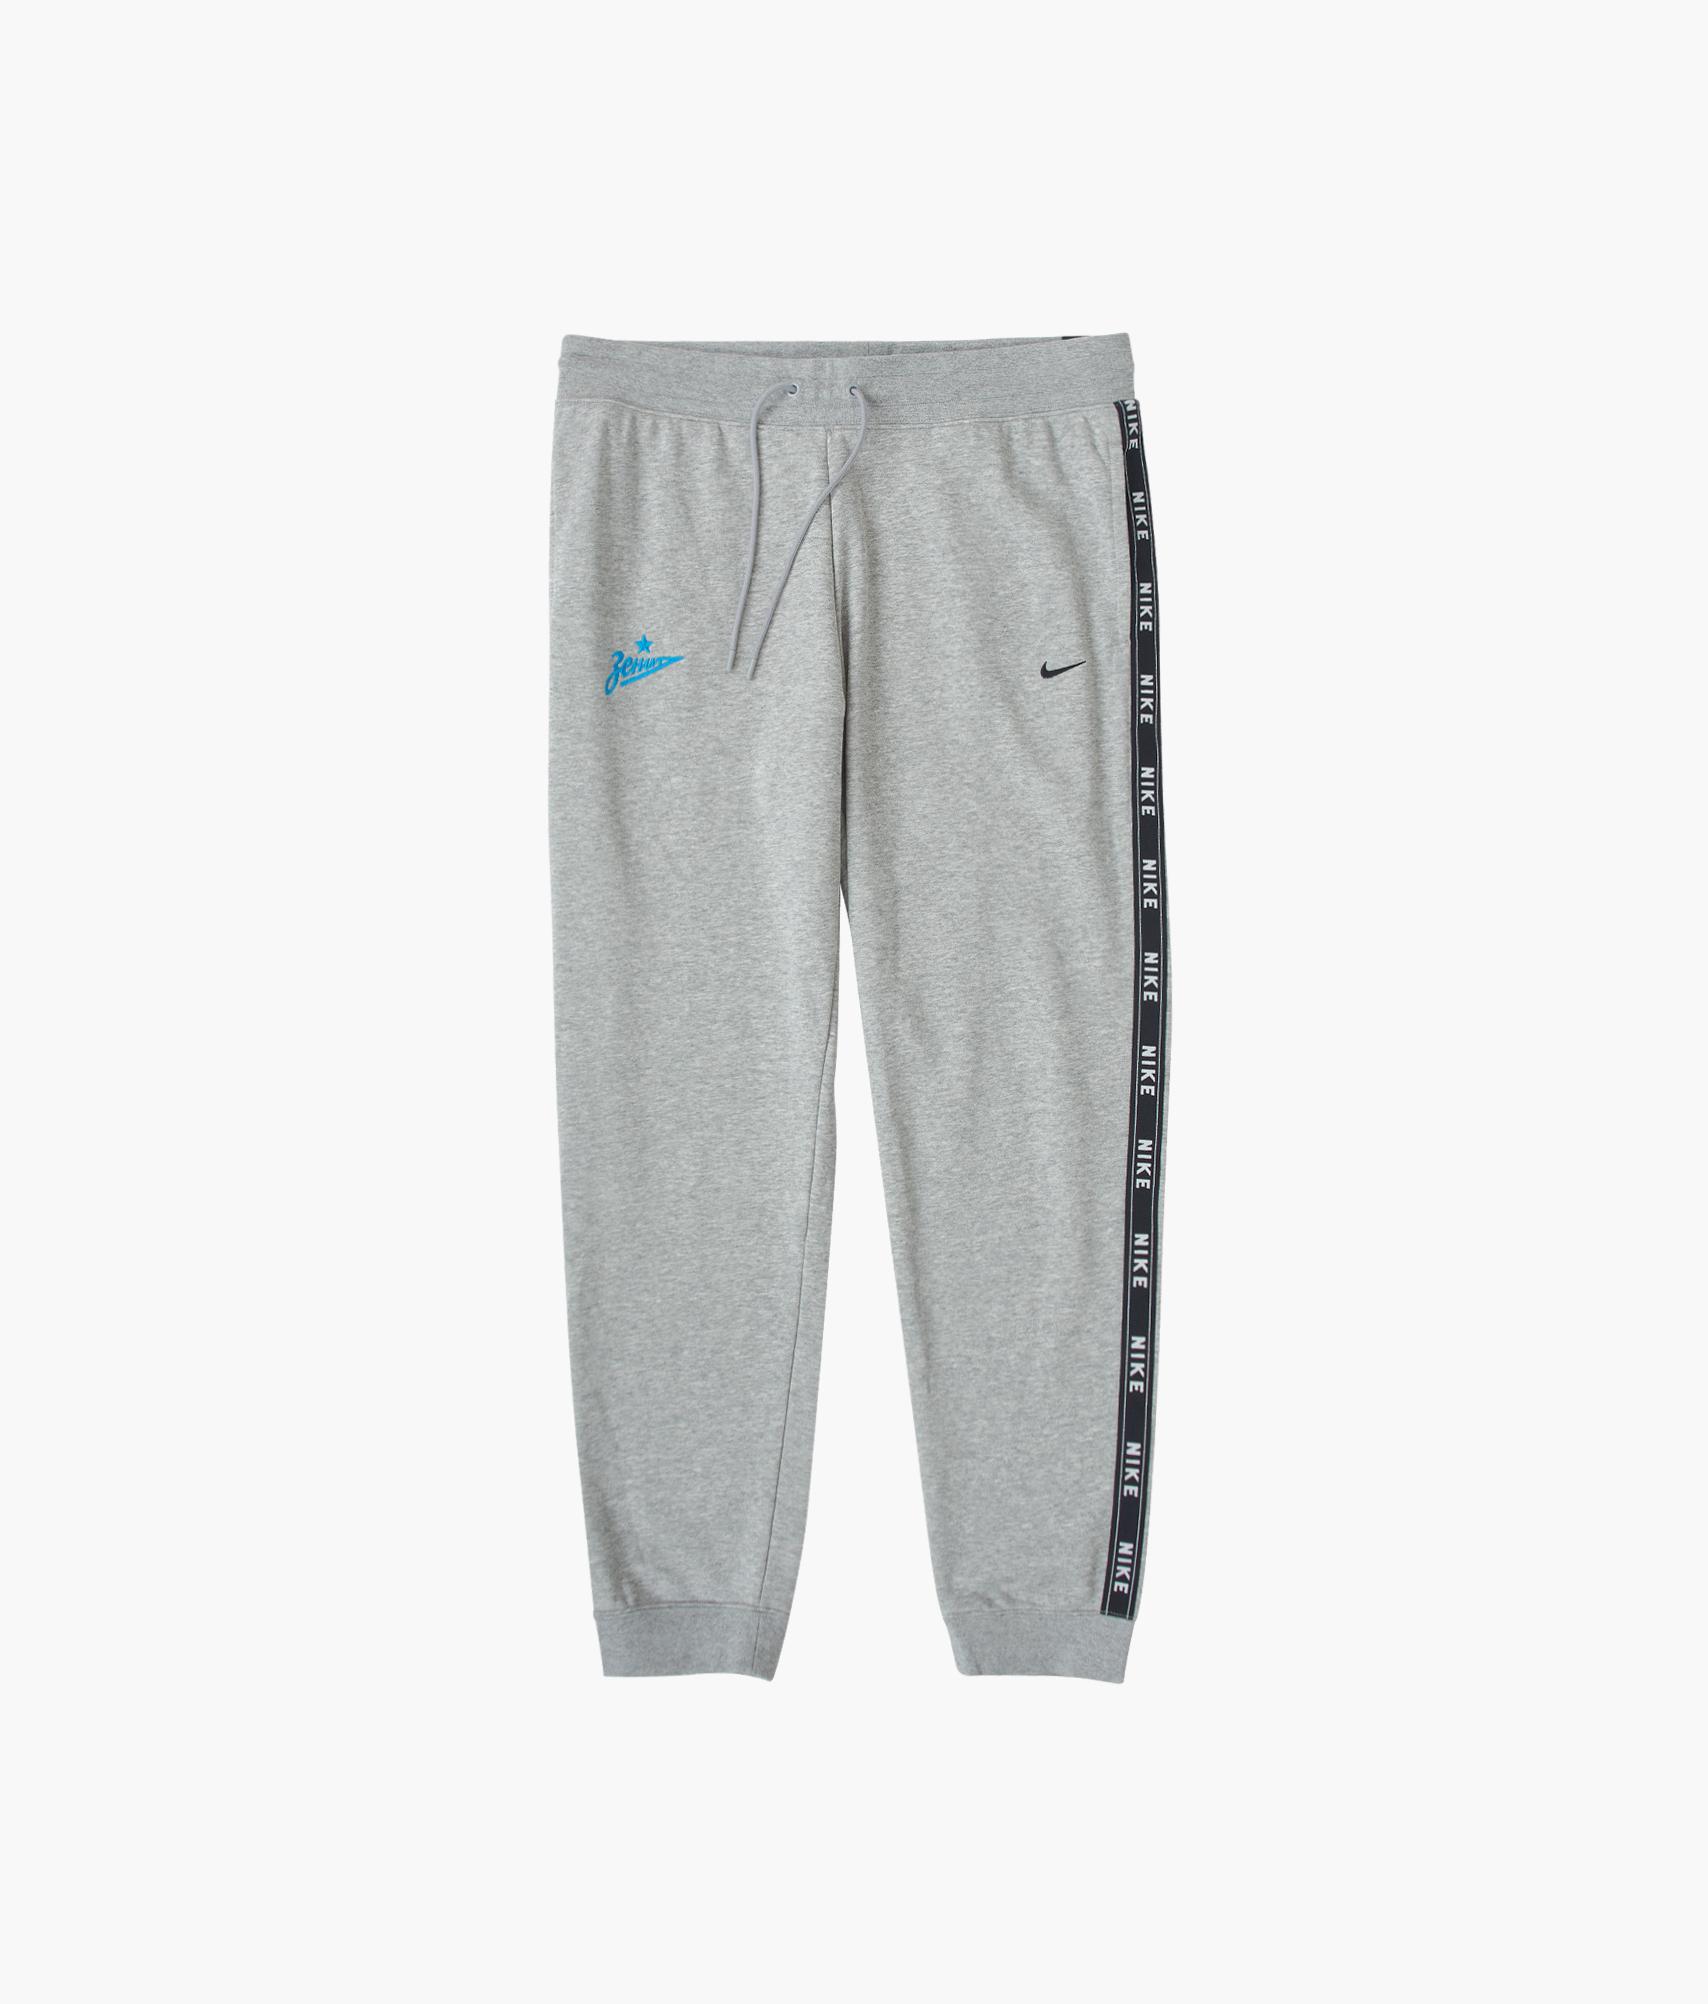 Брюки женские Nike Цвет-Серый